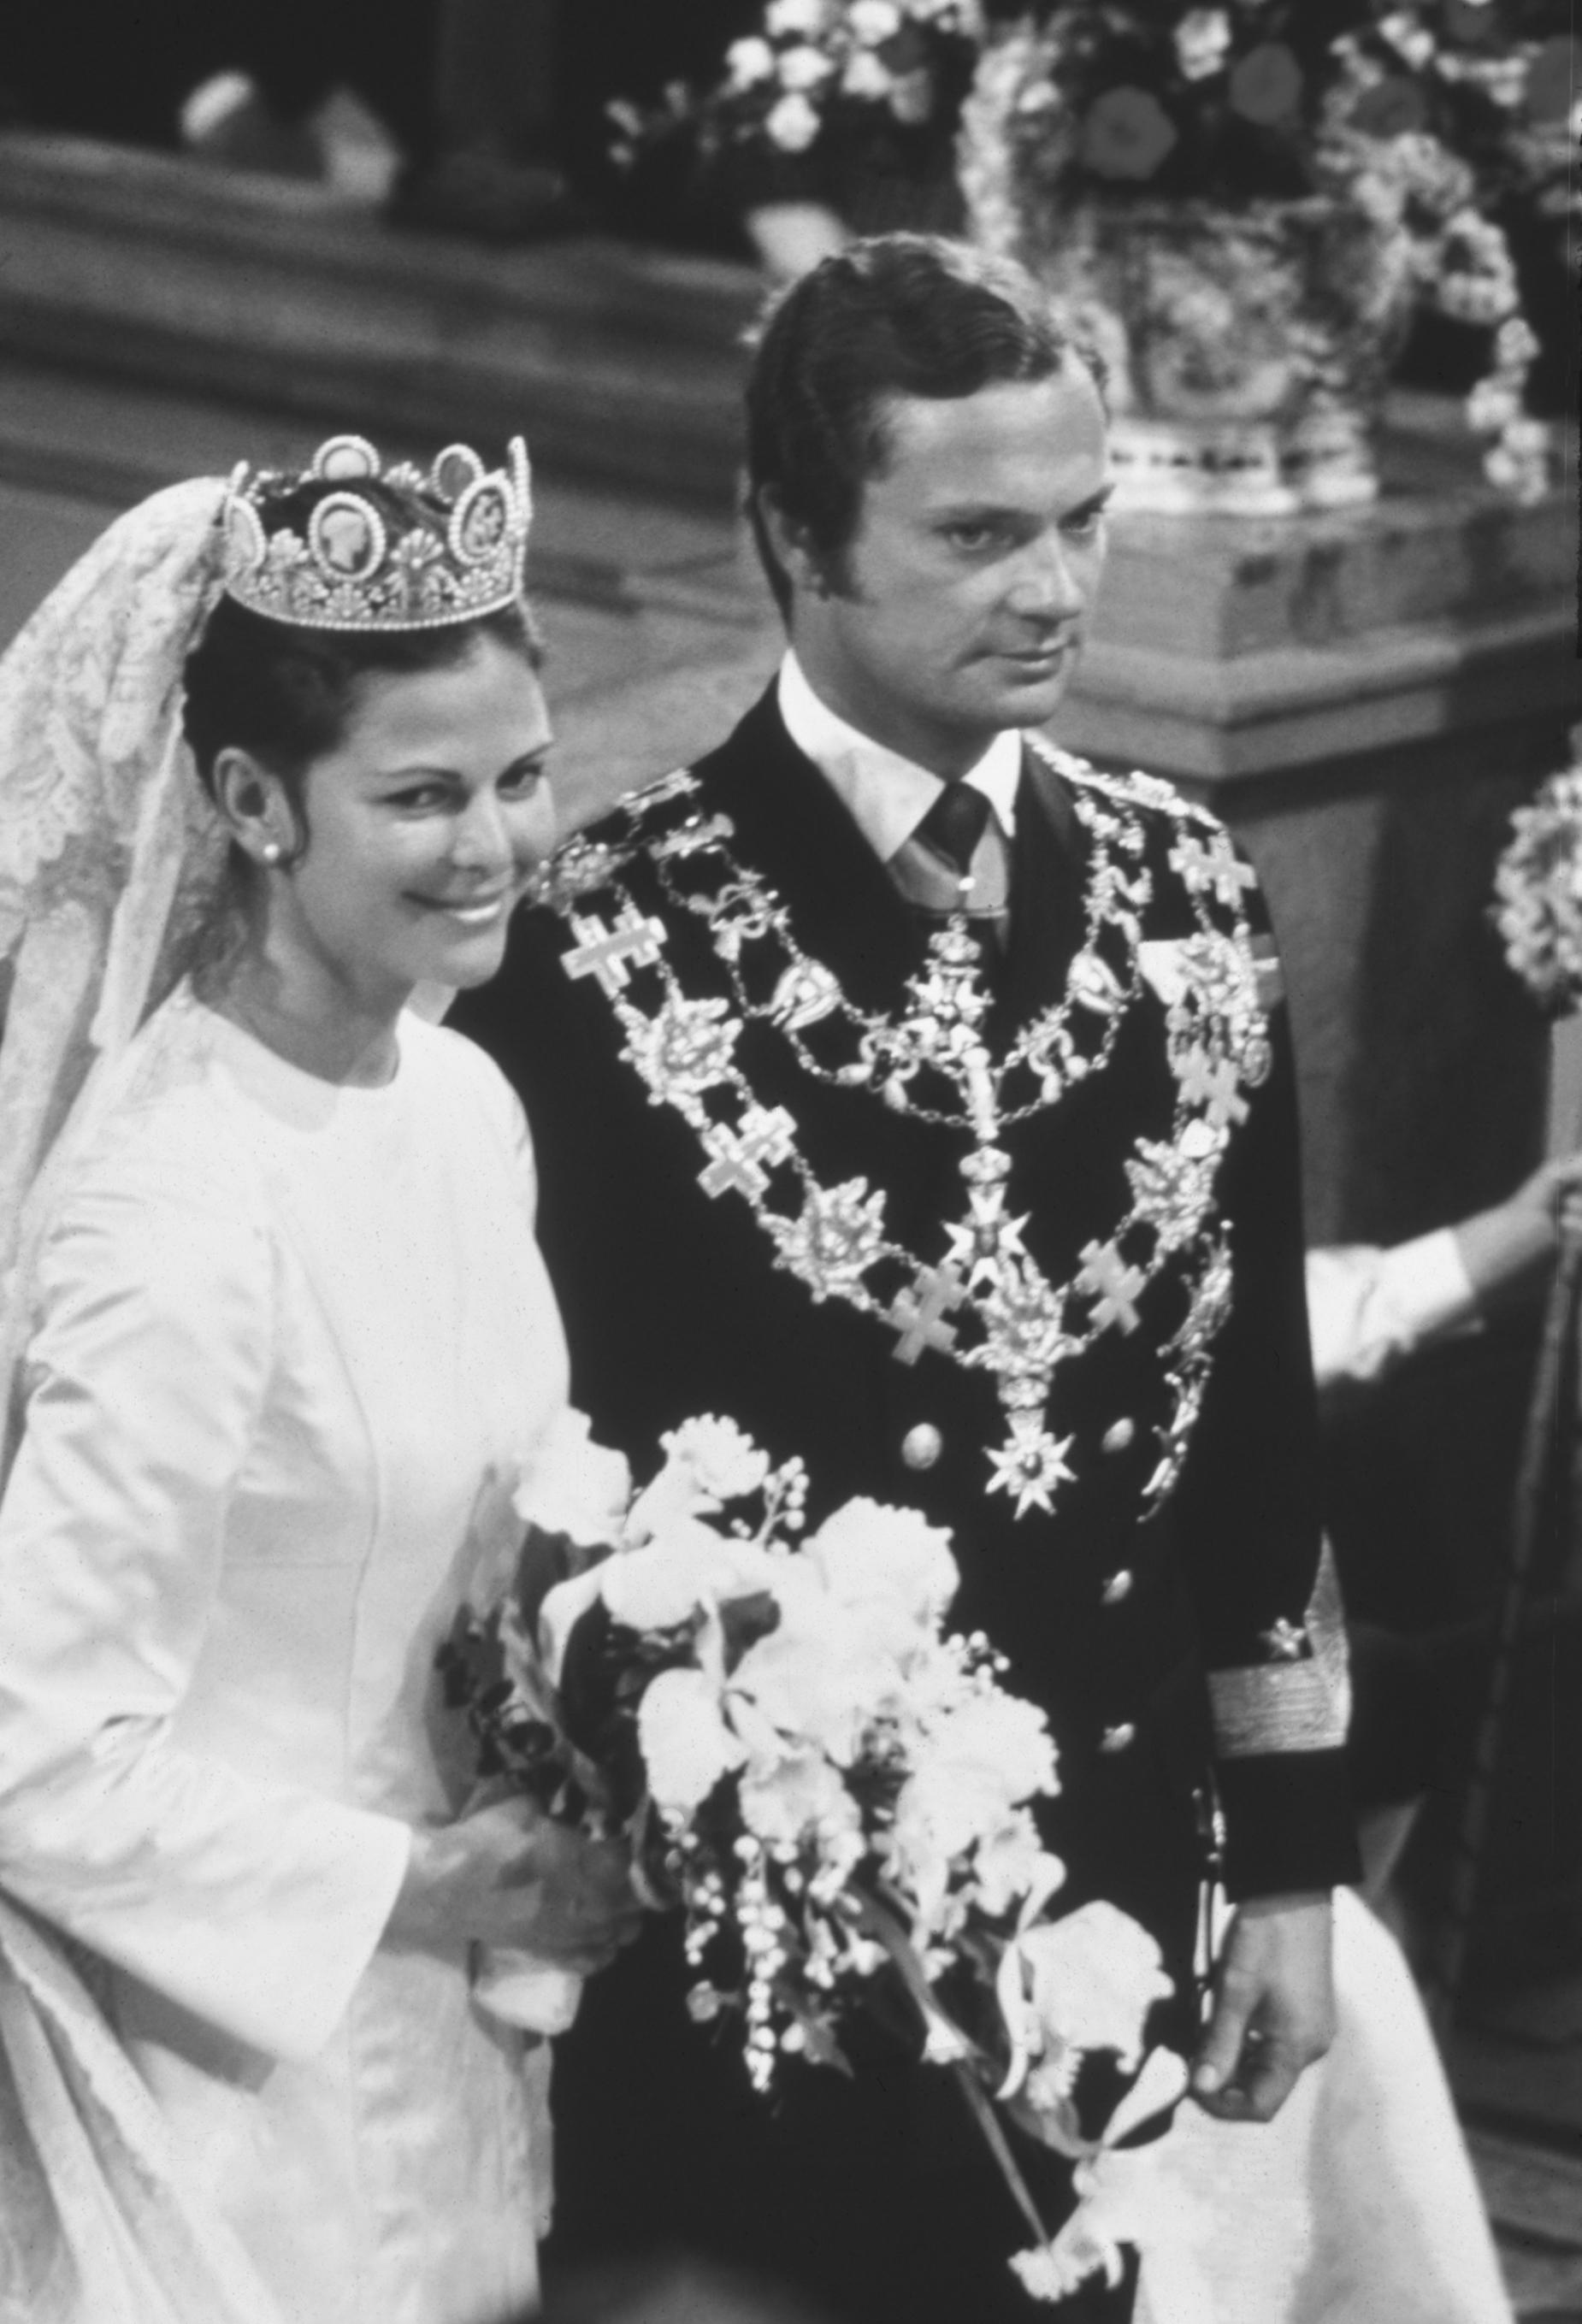 H.M. Konung Carl XVI Gustaf och H.M. Drottning Silvia. Bröllop den 19 juni 1976 i Storkyrkan i Stockholm HM King Carl XVI Gustaf and HM Queen Silvia. Wedding 19 june, 1976, The Cathedral, Stockholm